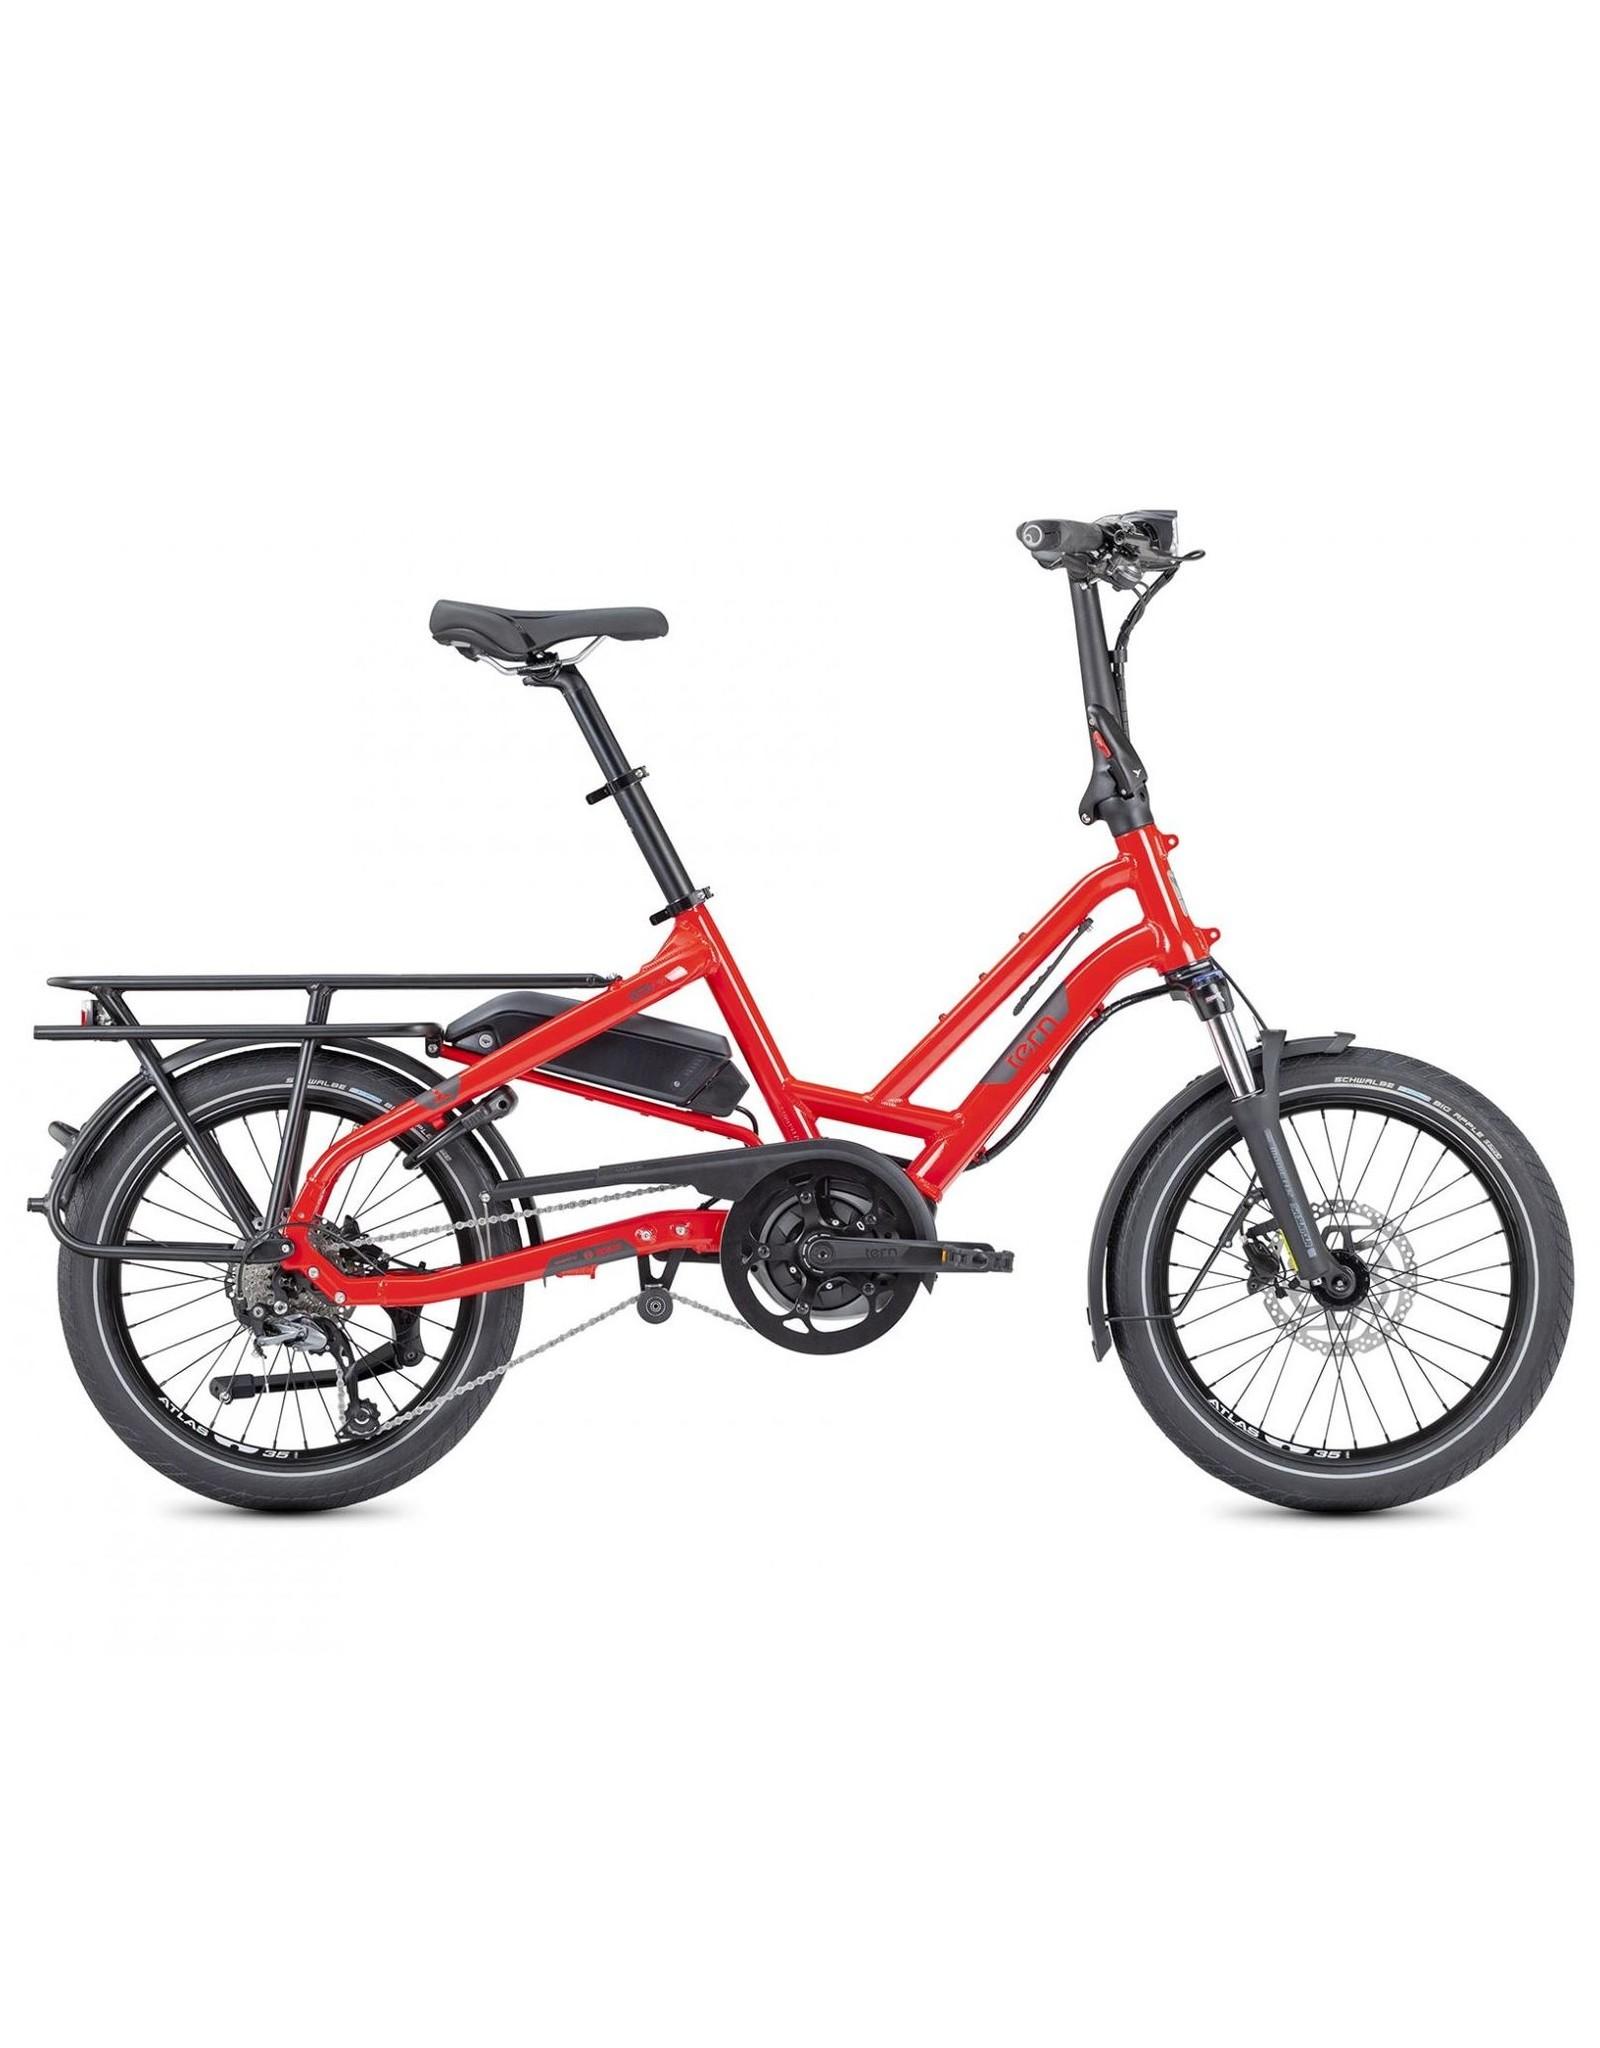 TERN TERN HSD P9 RED foldable electric assist cargo bike